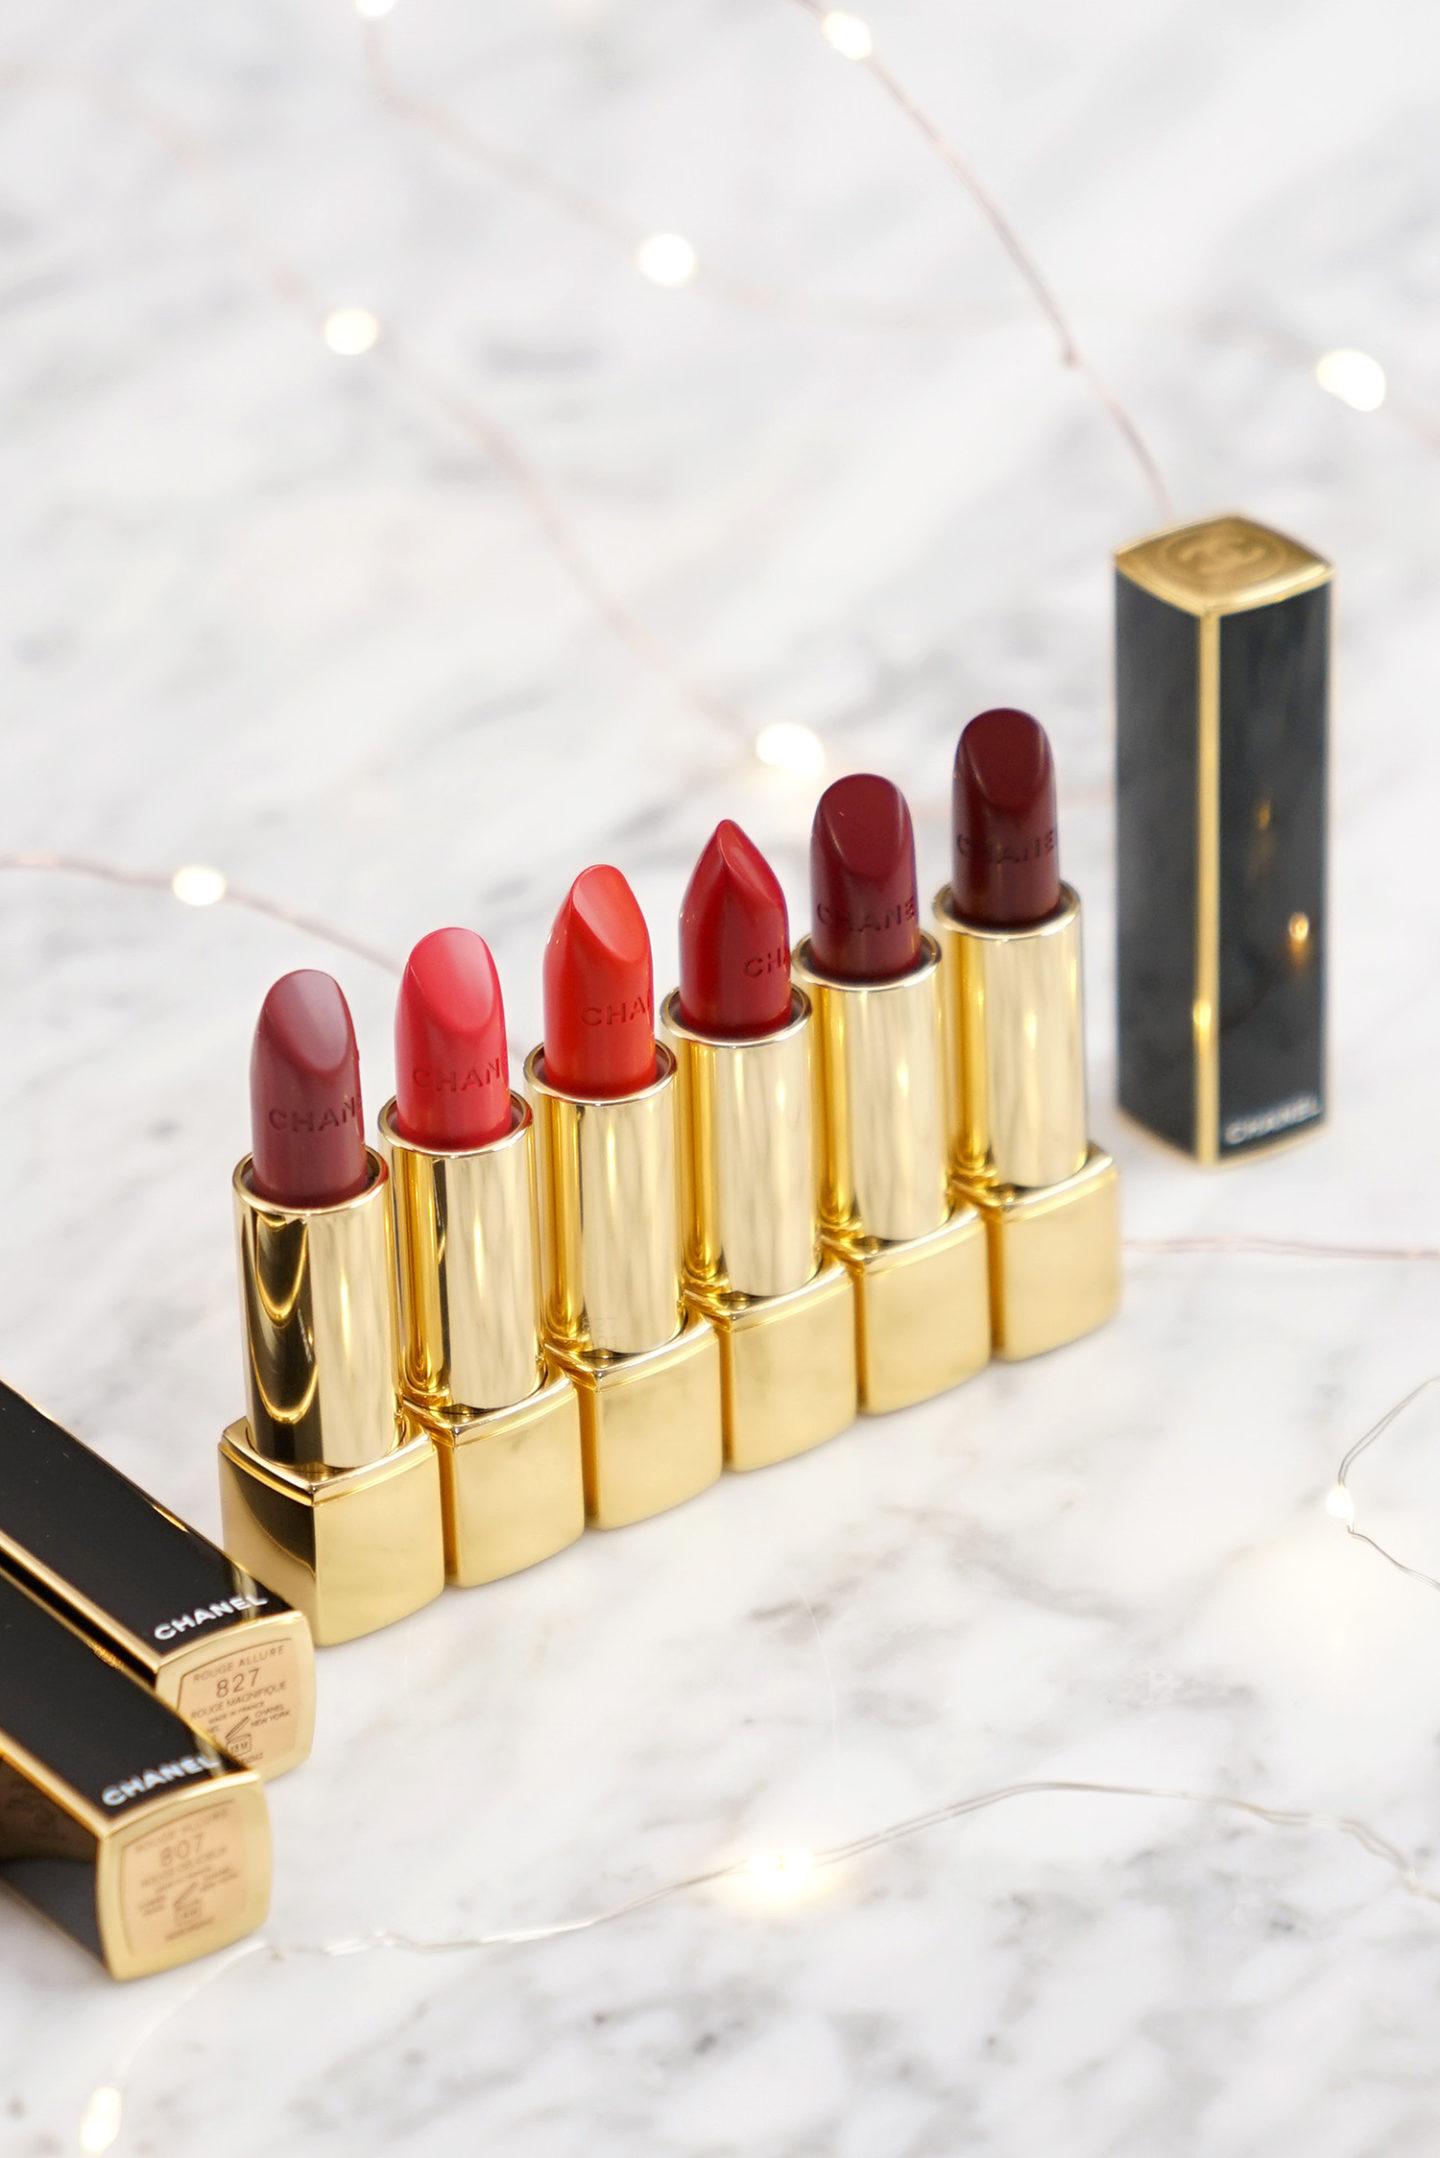 Rouge à lèvres Chanel Holiday 2019 Rouge Allure